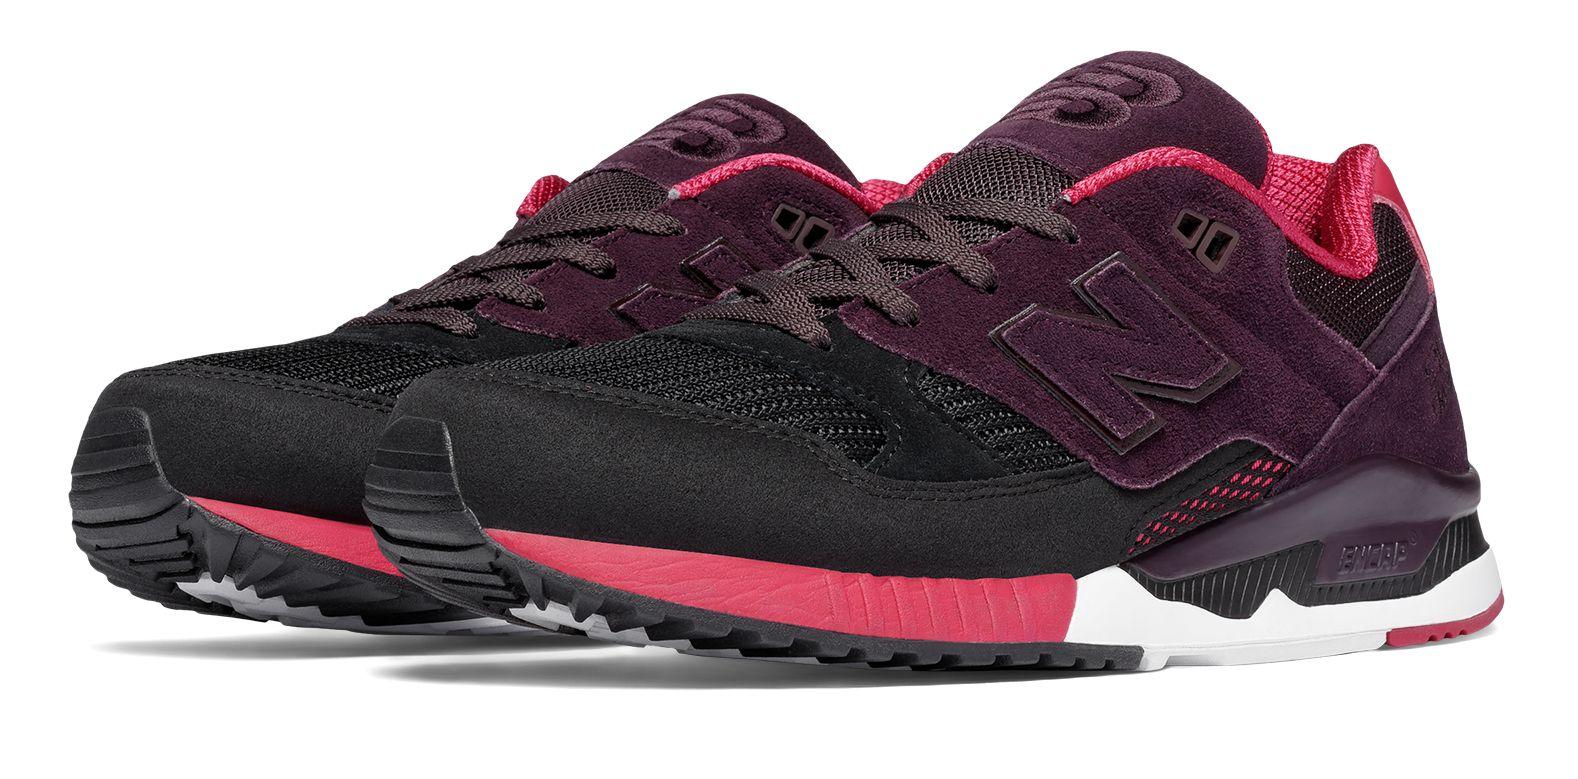 New Balance : 530 Bionic Boom : Men's Footwear Outlet : M530RTA